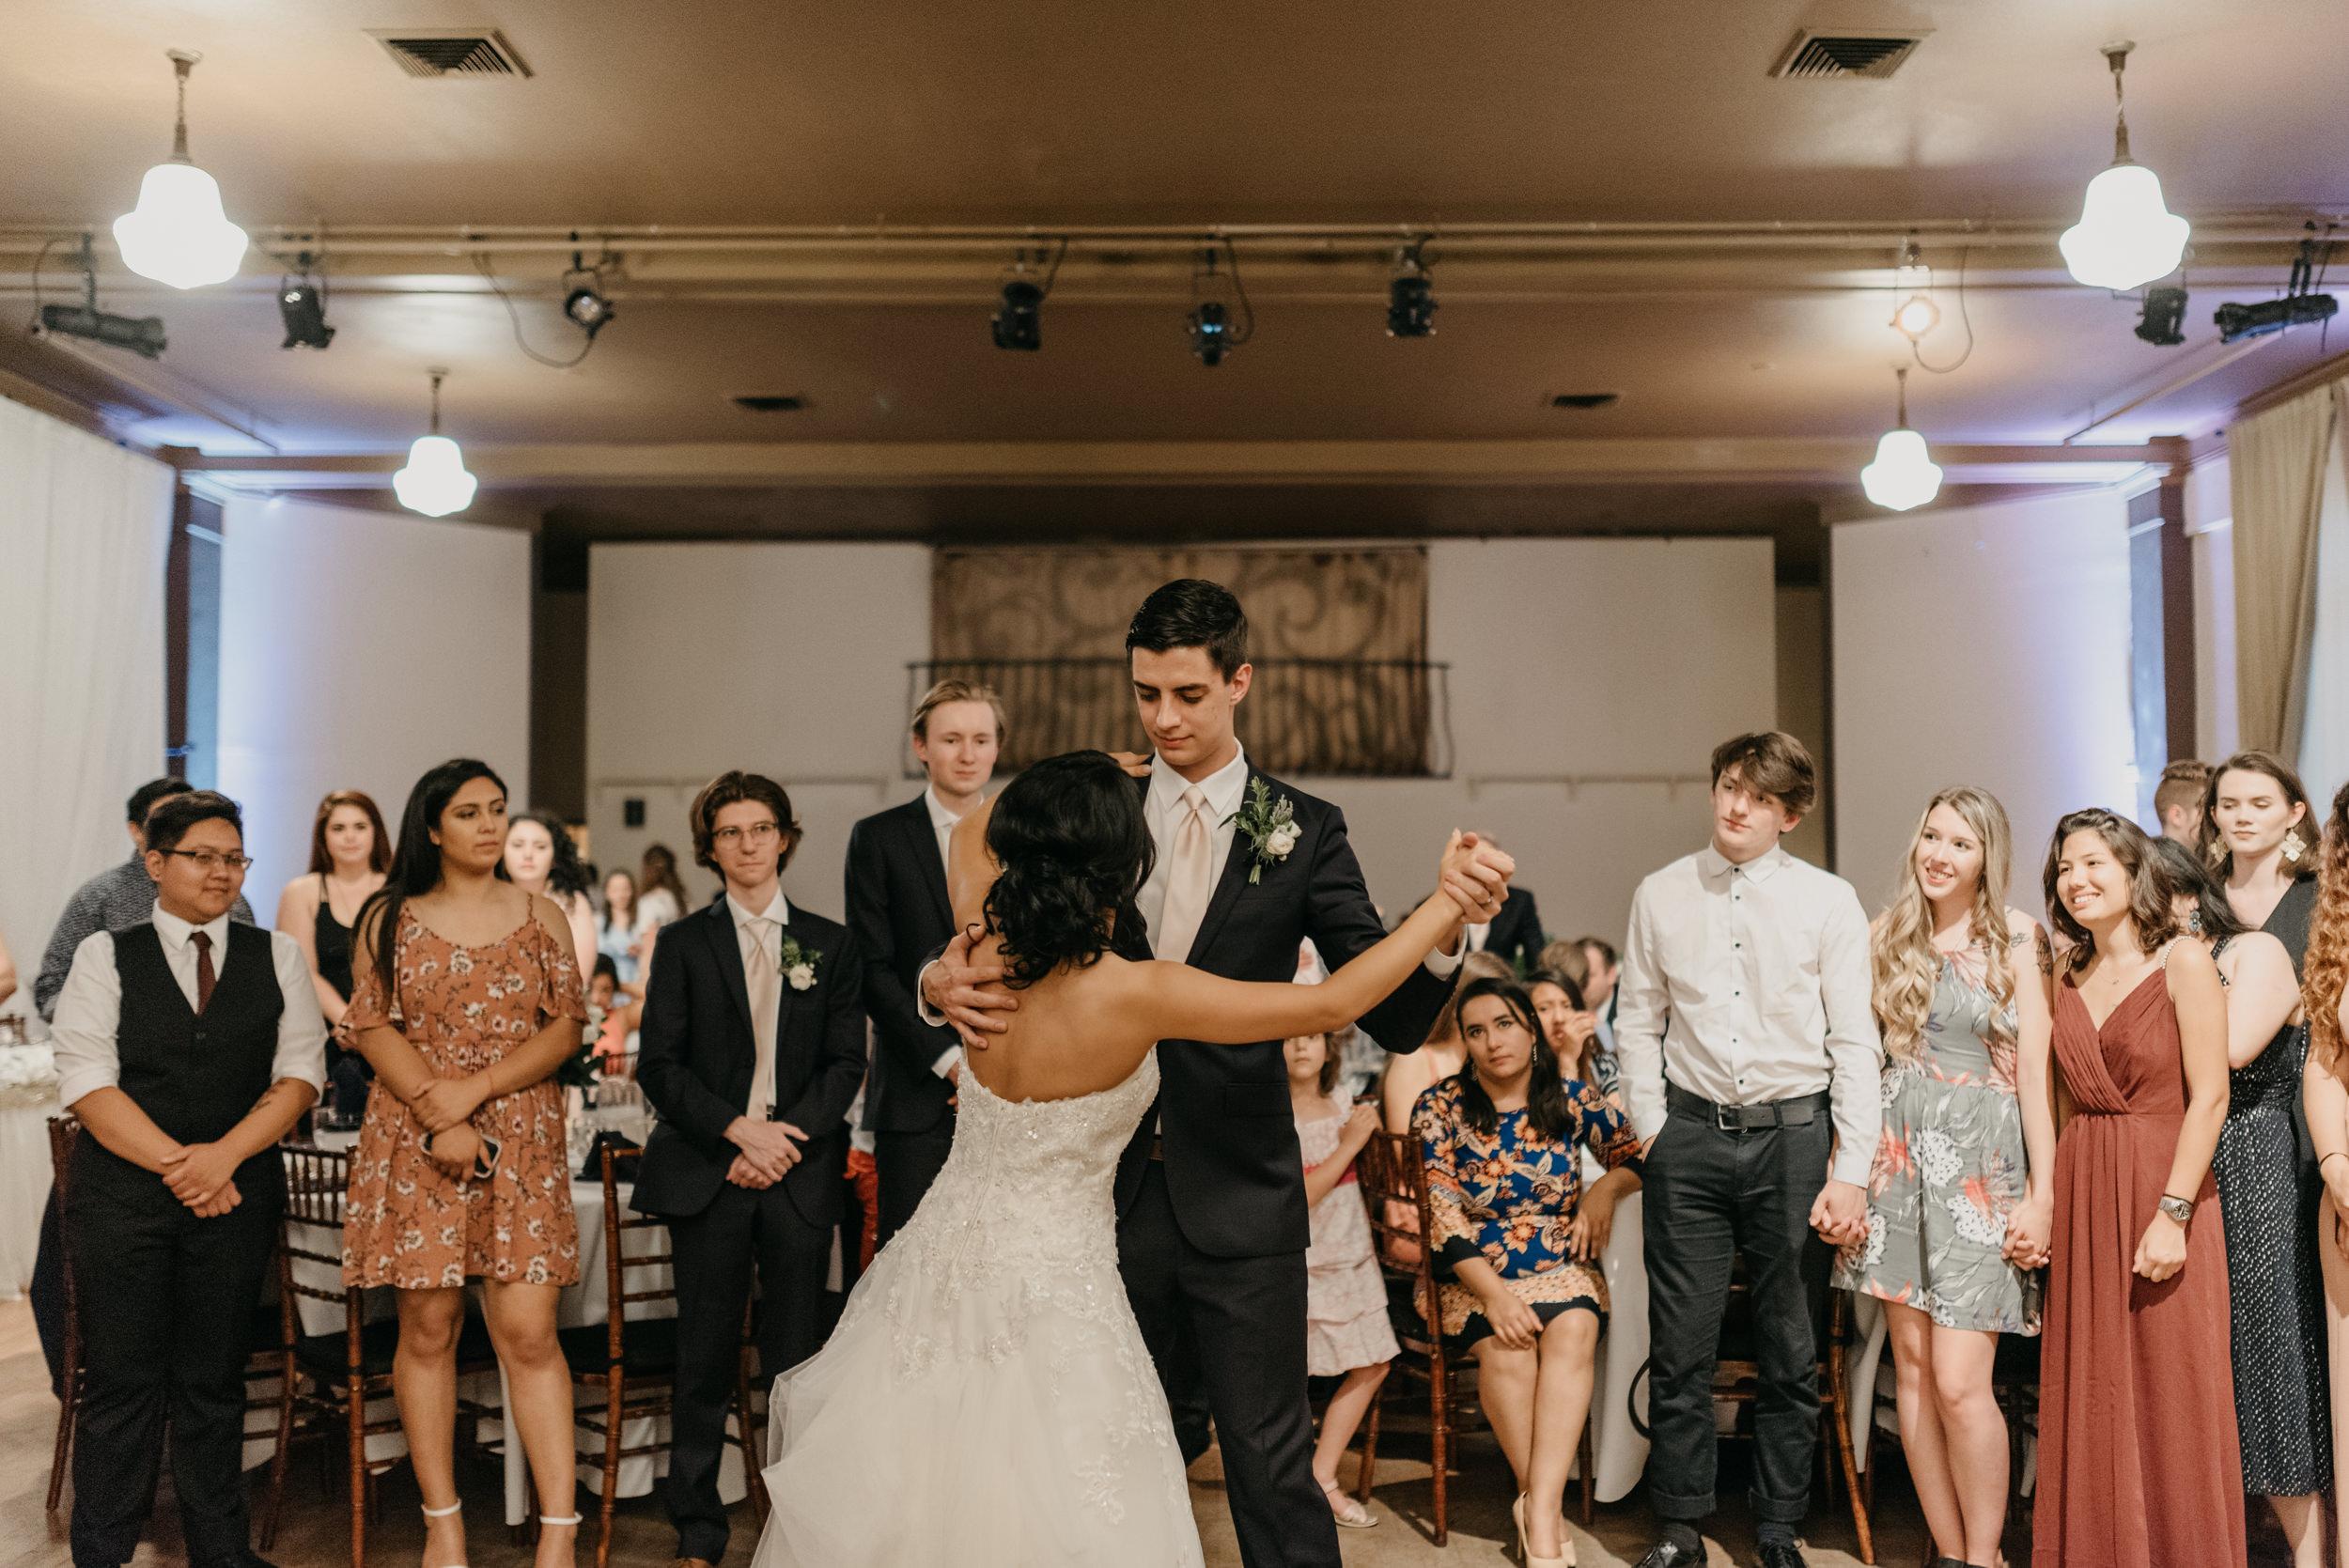 119-reception-west-end-ballroom-portland-wedding-photographer-8685.jpg